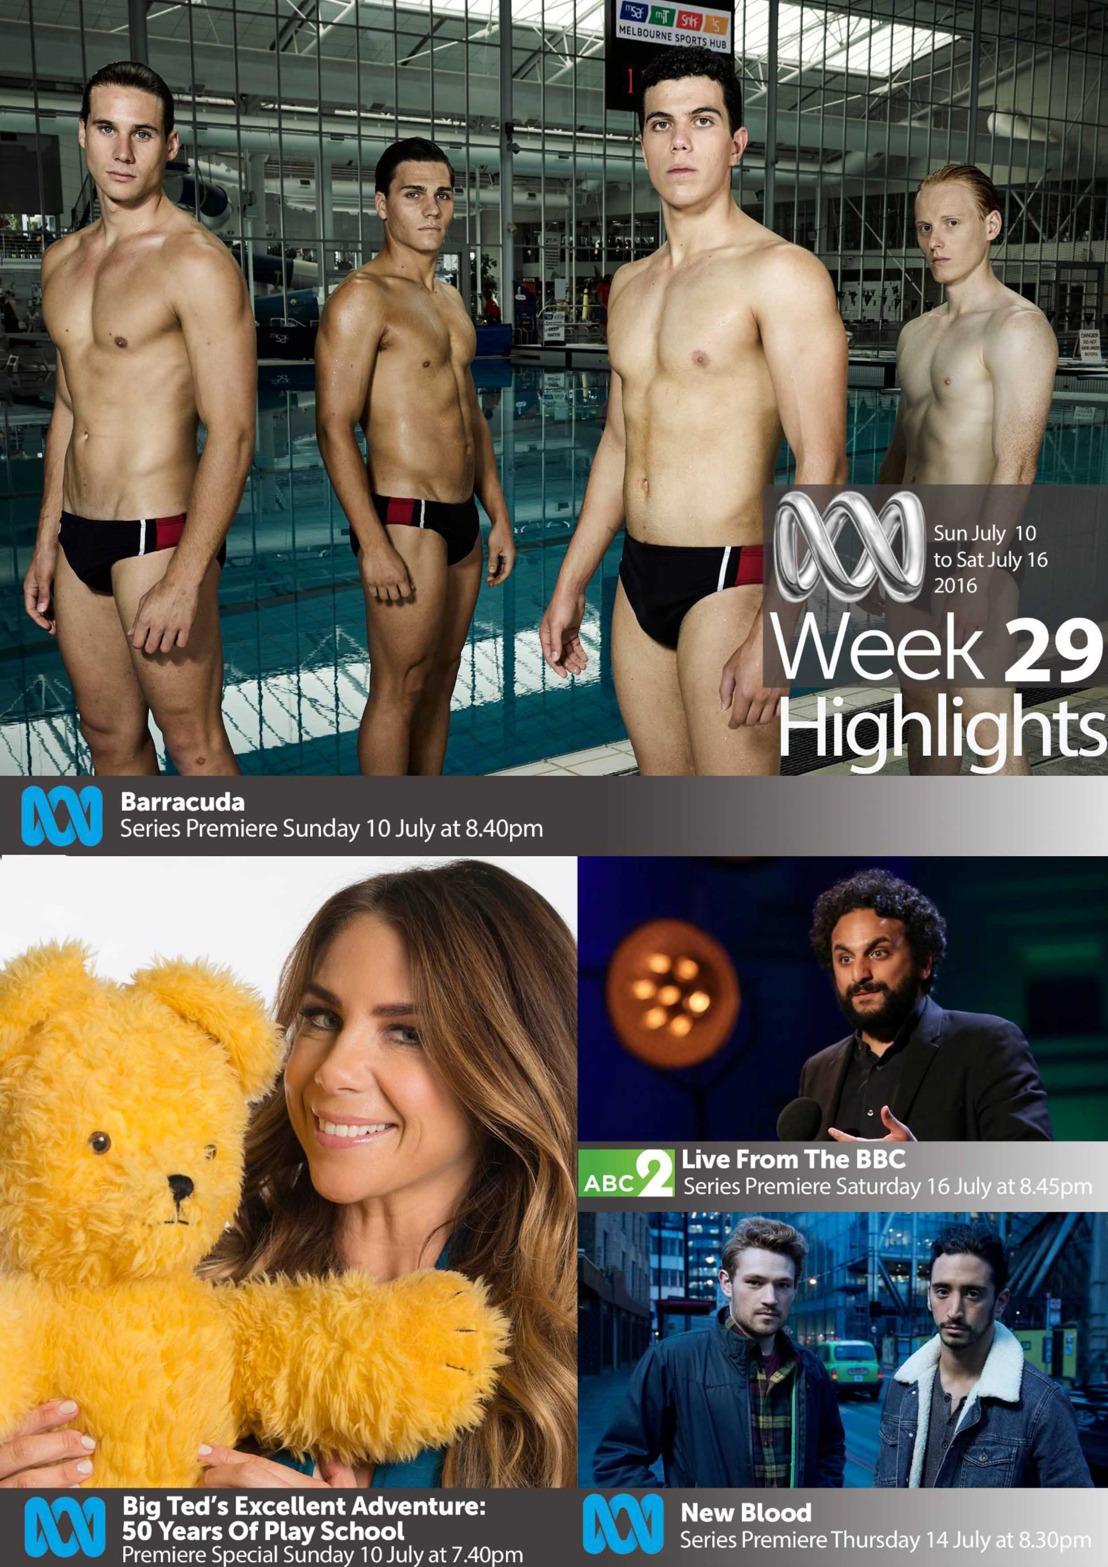 ABC Program Highlights - Week 29